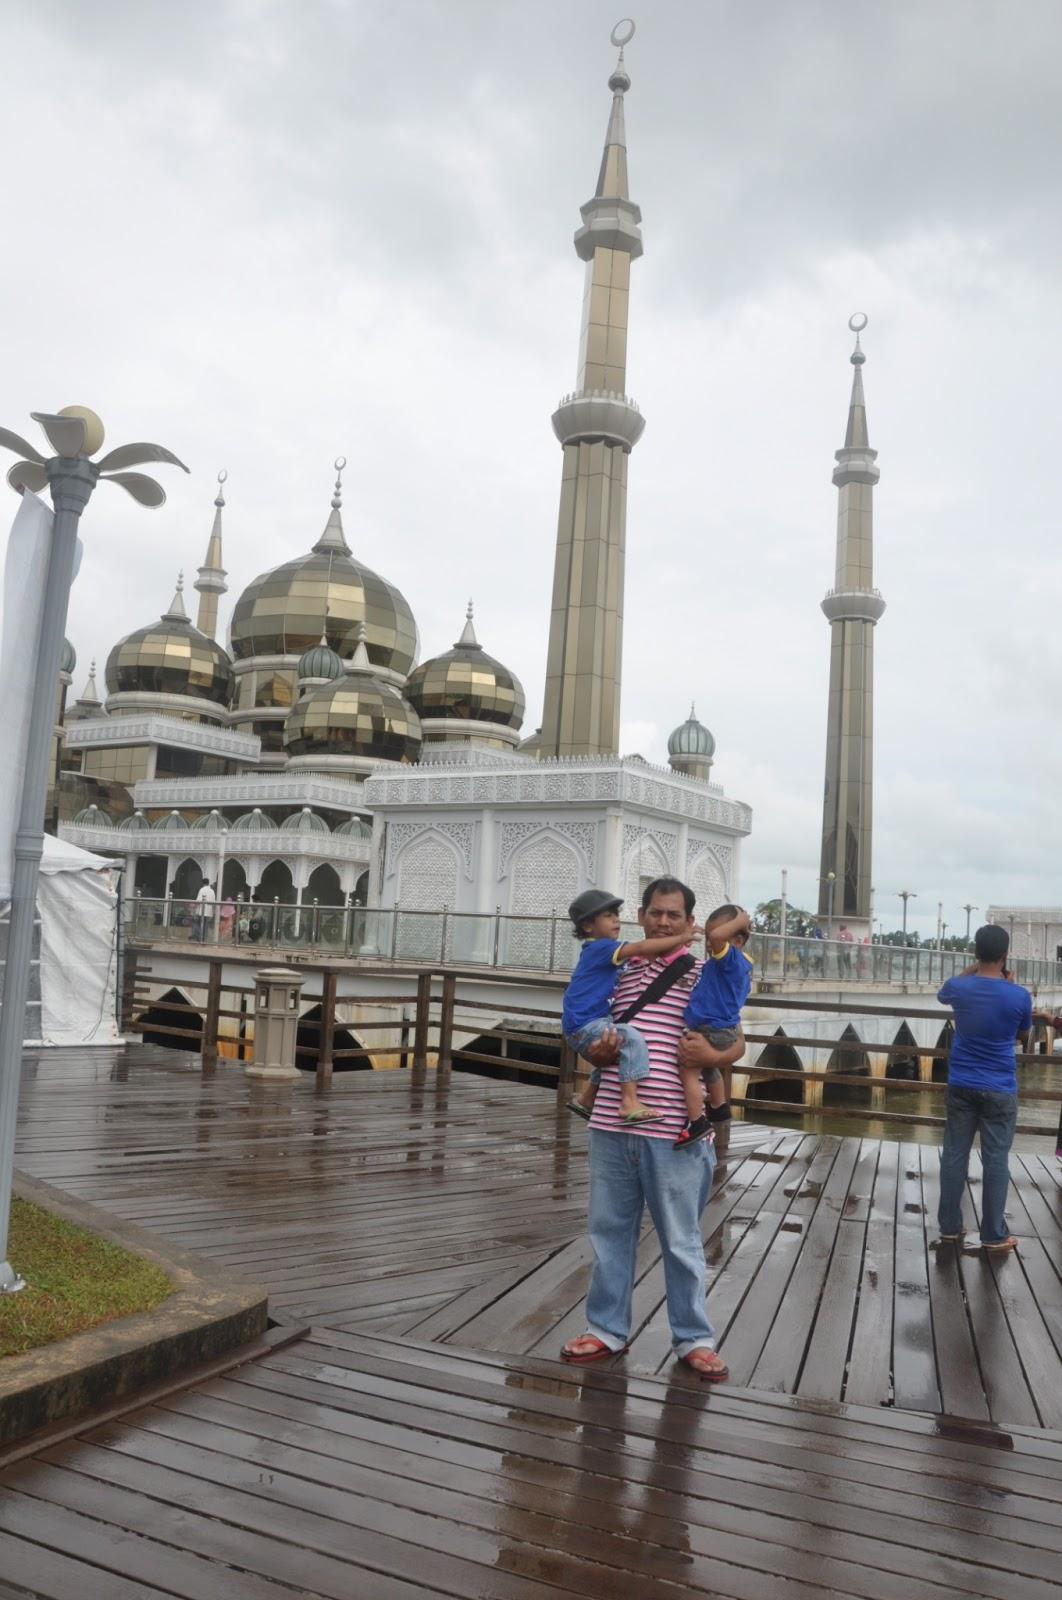 Ini Saje Tempat Yg Kami Dapat Pergi Sebenarnya Banyak Lagi Menarik Di Terengganu Contohnya Muzium U Duyong Redang